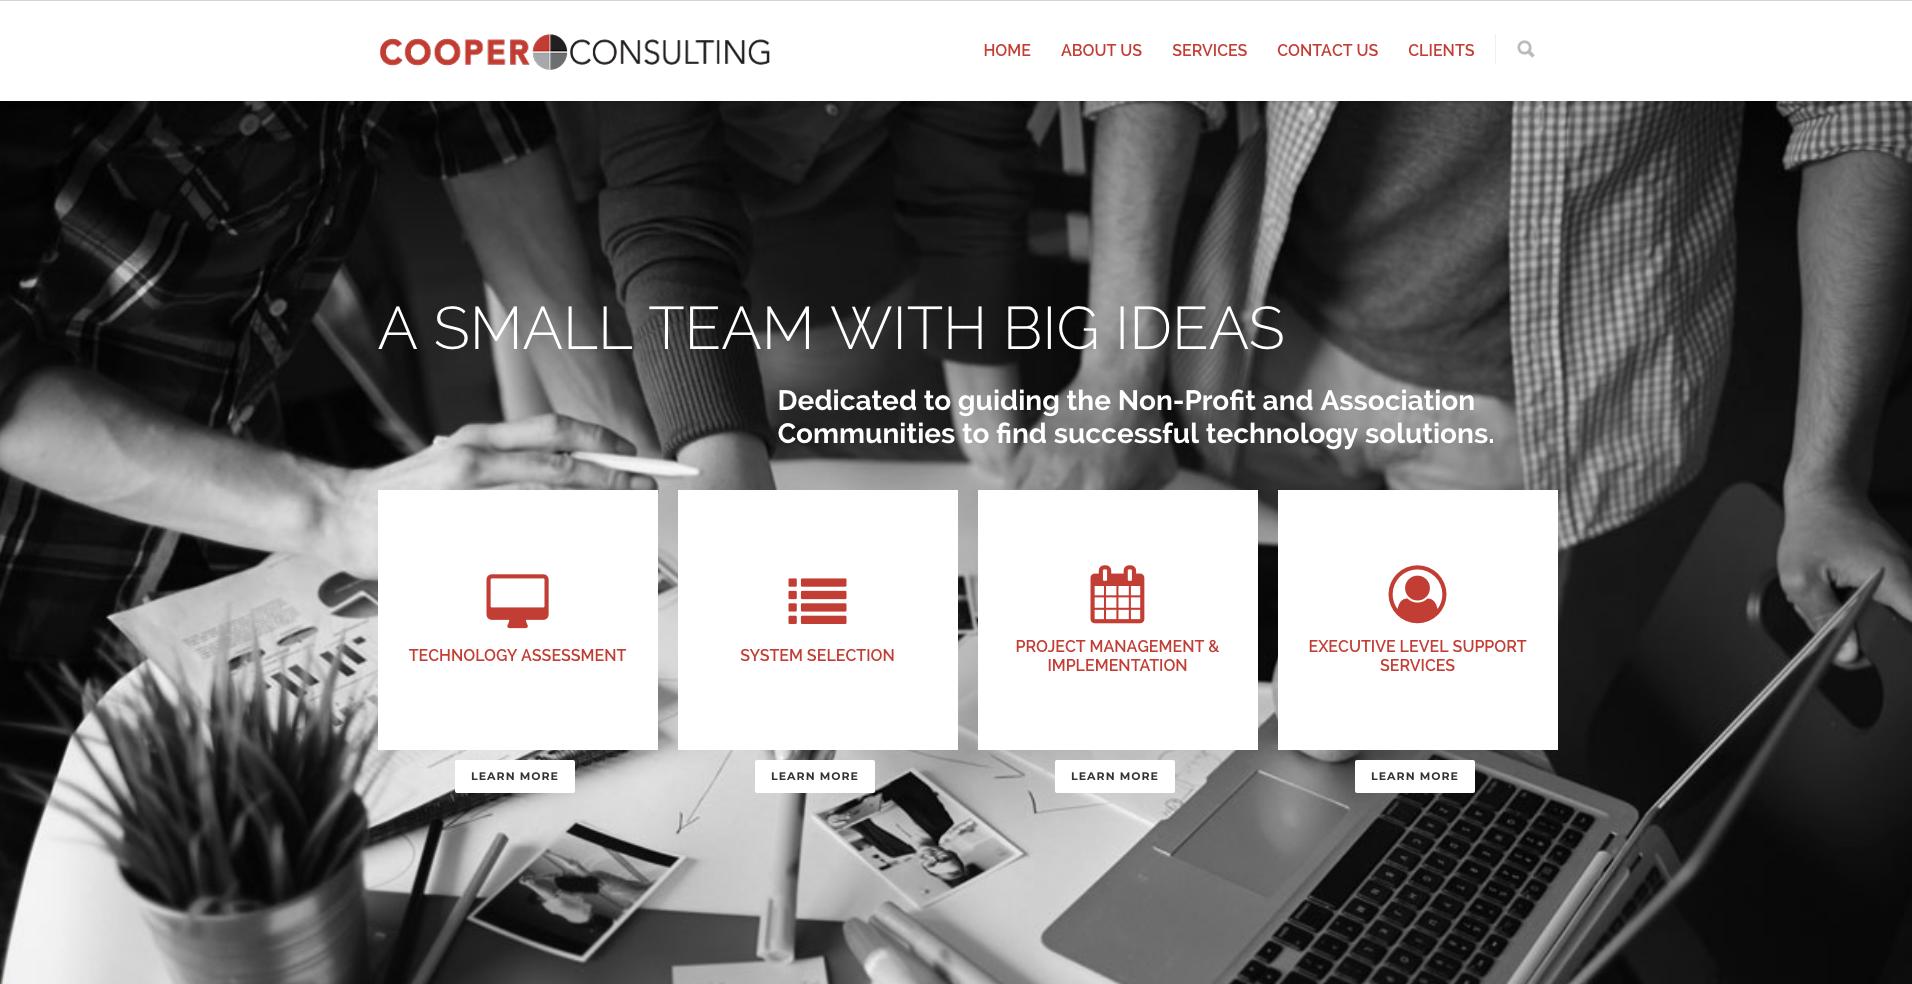 Cooper Consulting Website designed by Big Rock Studio